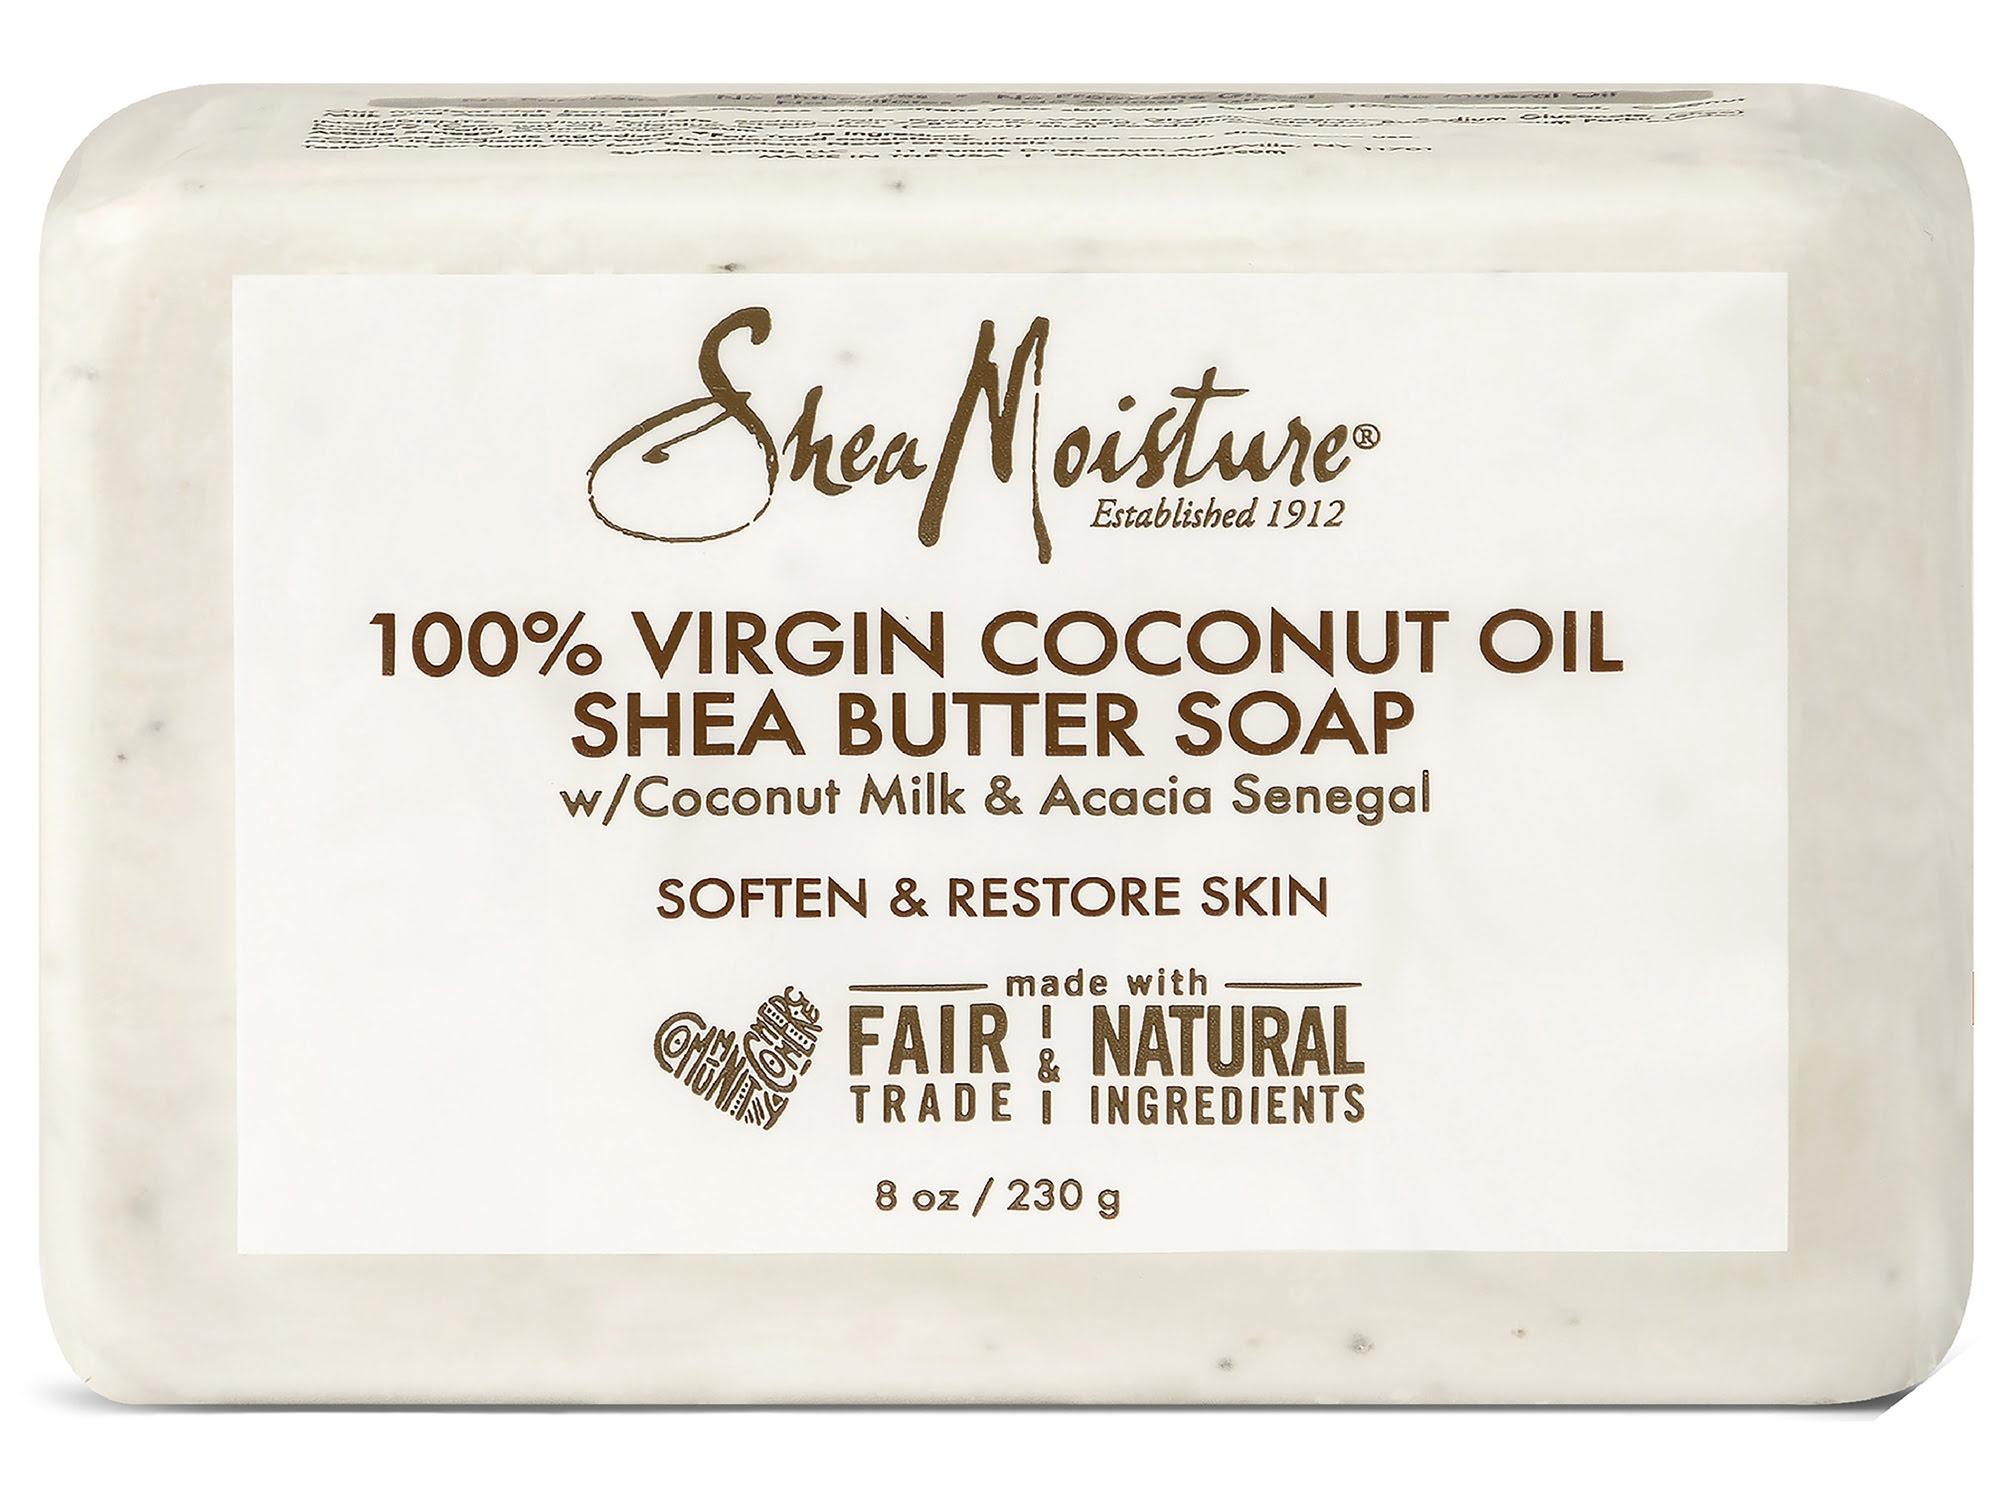 SheaMoisture 100% Virgin Coconut Oil Daily Hydration Bar Soap